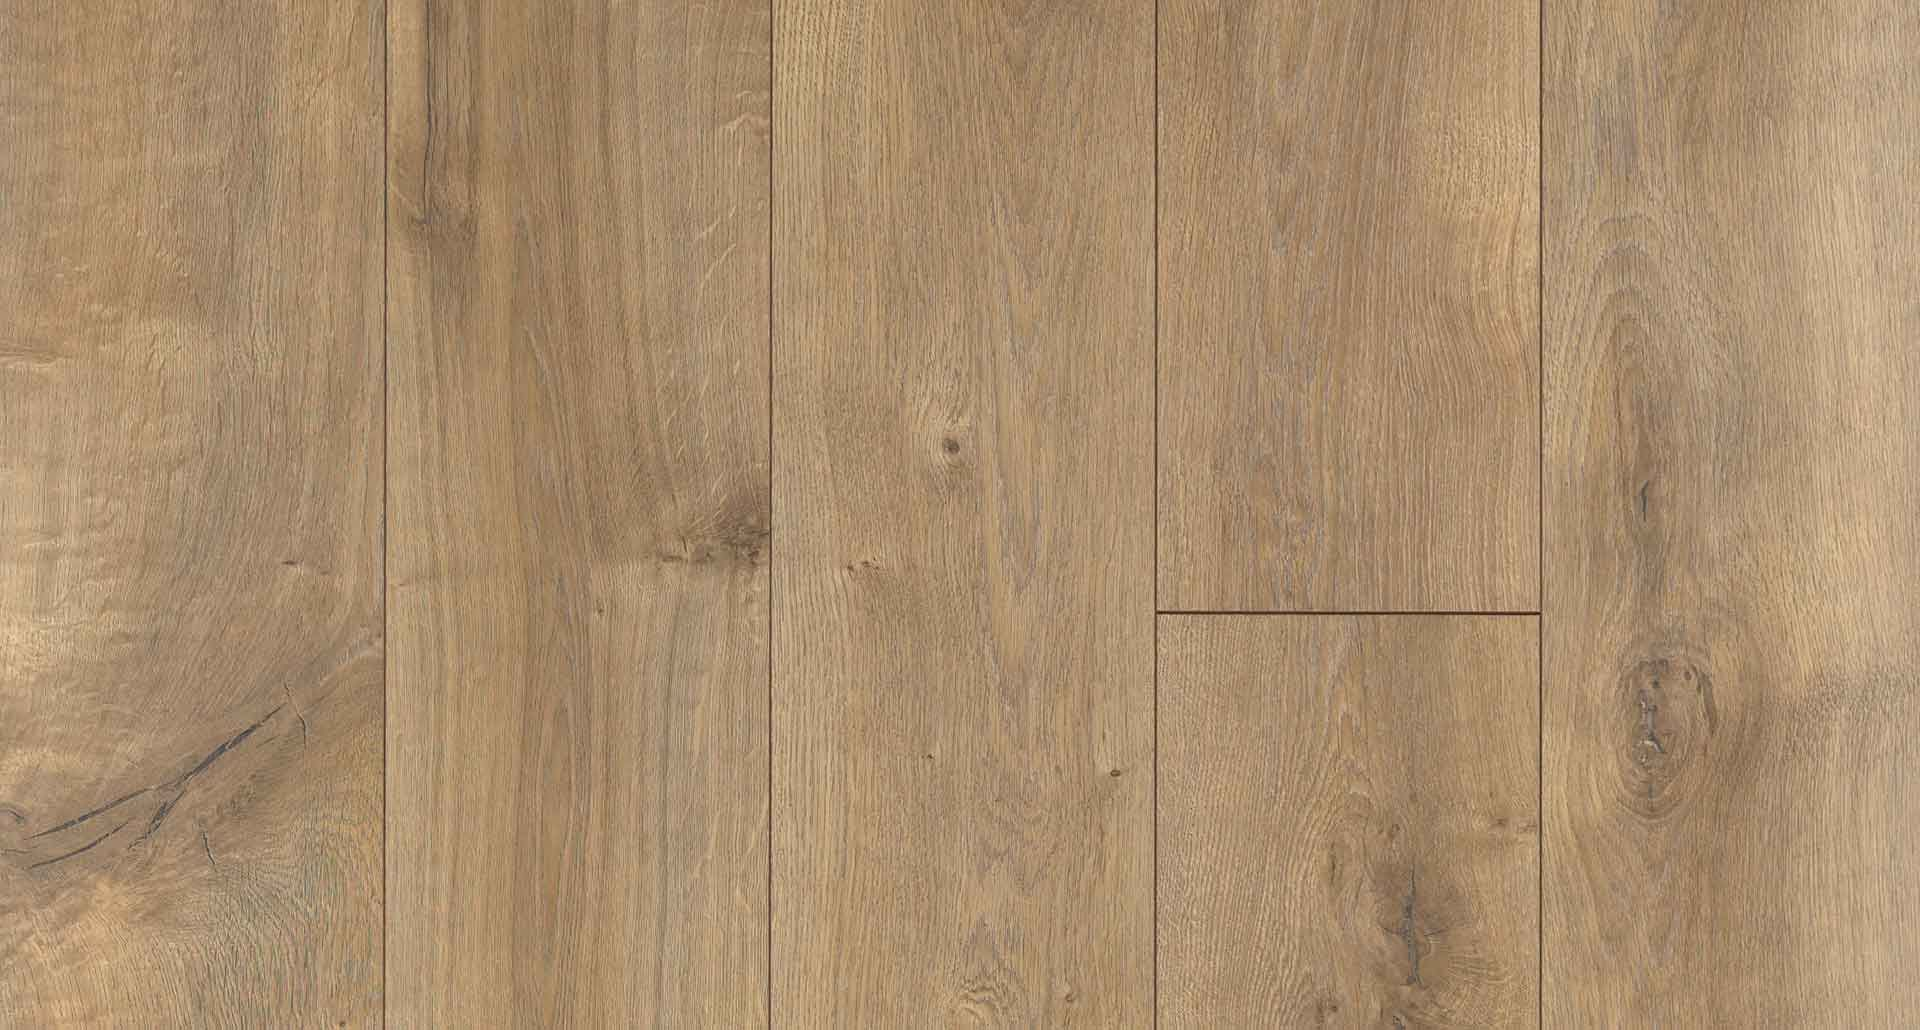 Riverbend Oak Textured Laminate Floor Medium Oak Wood Finish 10mm 1 Strip Plank Laminate Flooring Easy To Install And Pergo Flooring Laminate Flooring Pergo